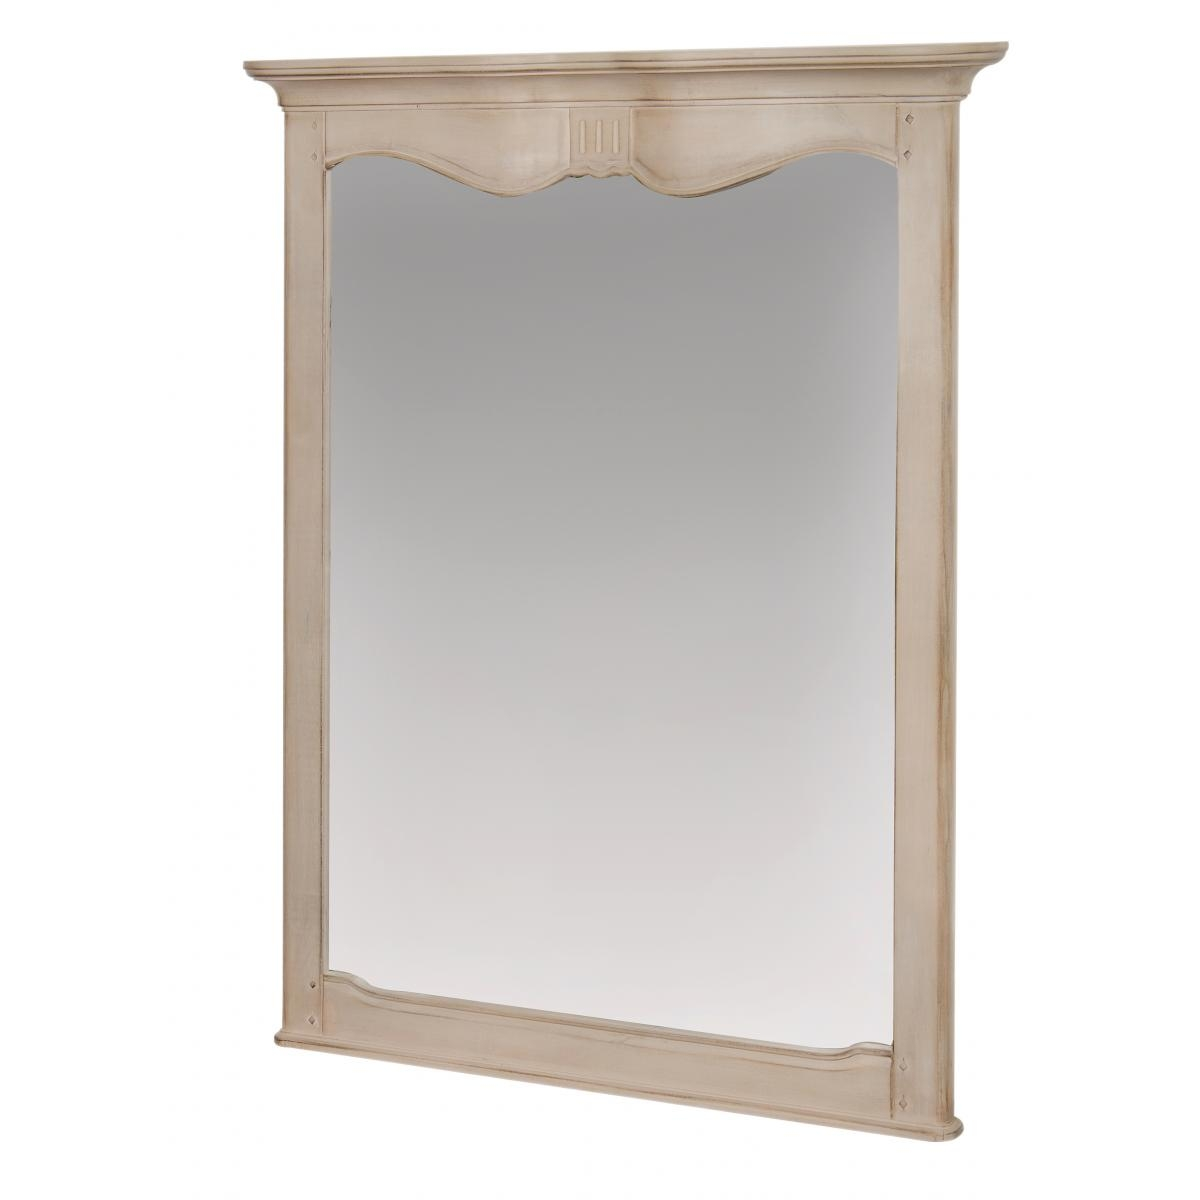 Oglinda Decorativa Lemn Mesteacan Poza